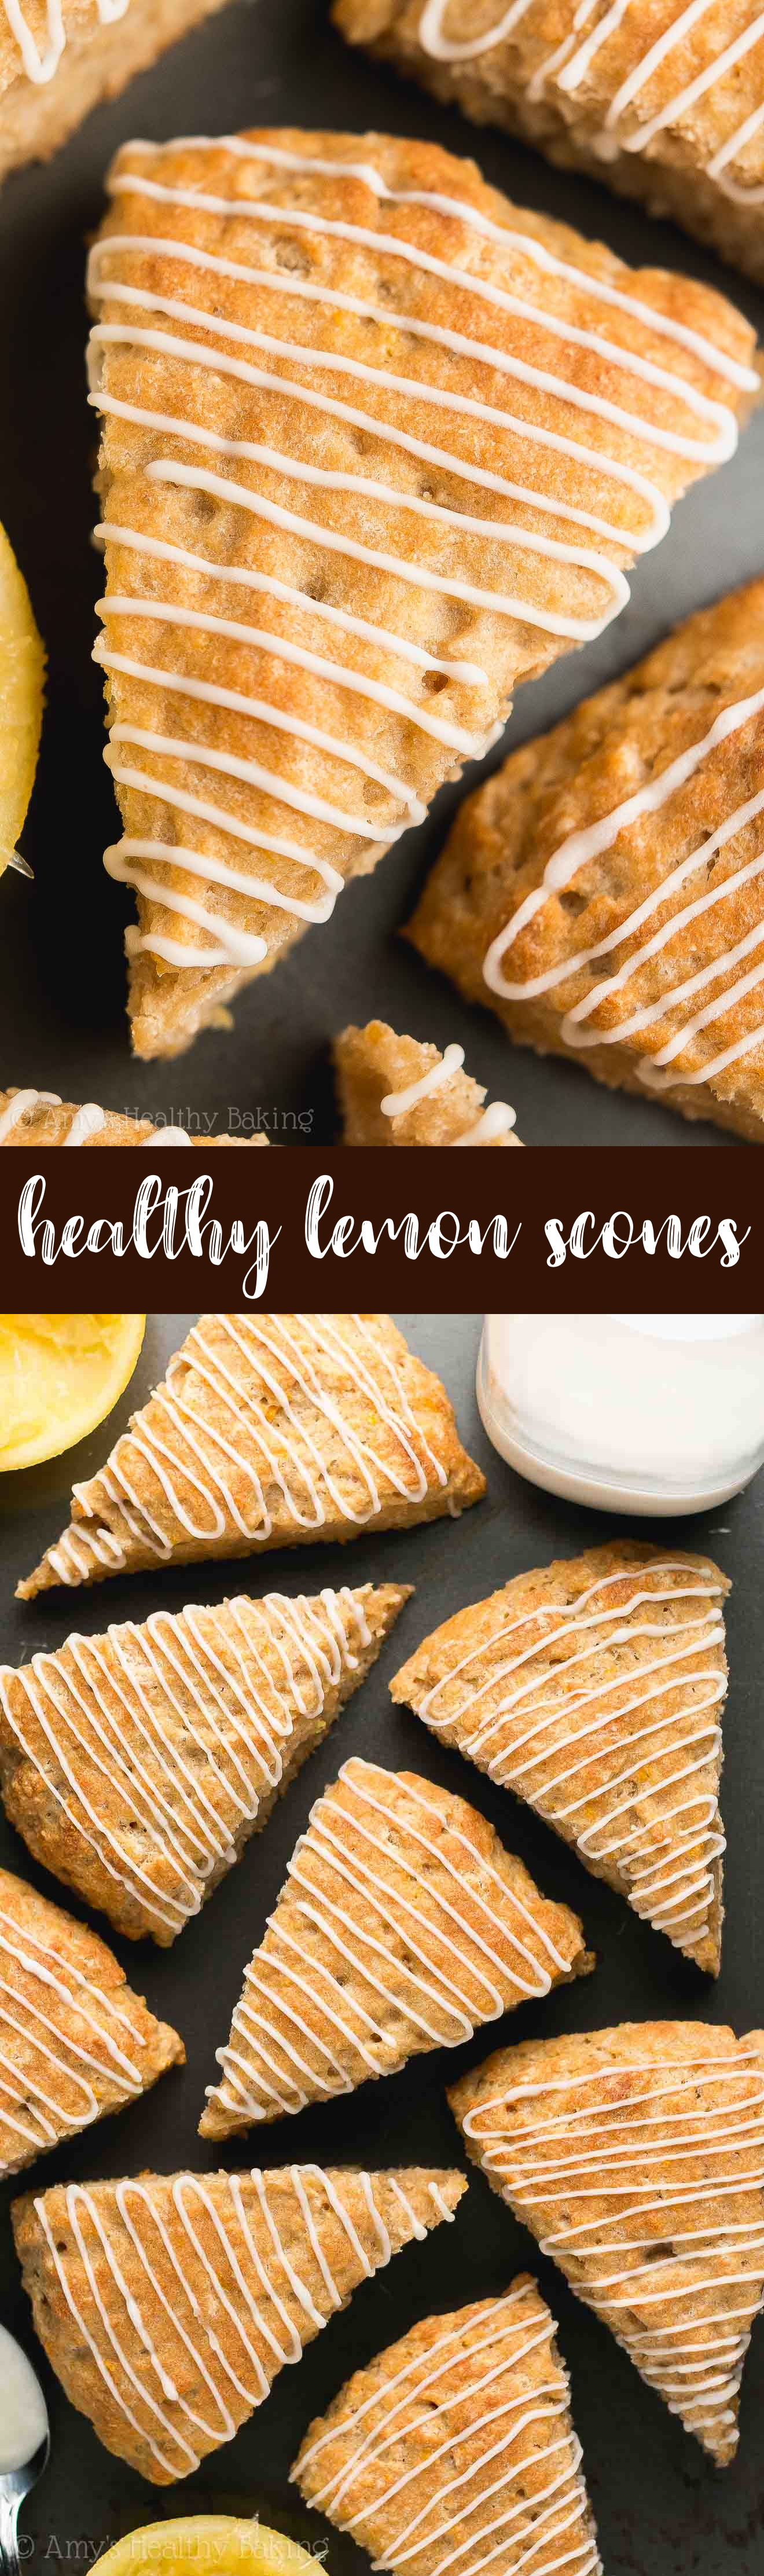 The Best Clean Eating Healthy Lemon Scones with Lemon Glaze